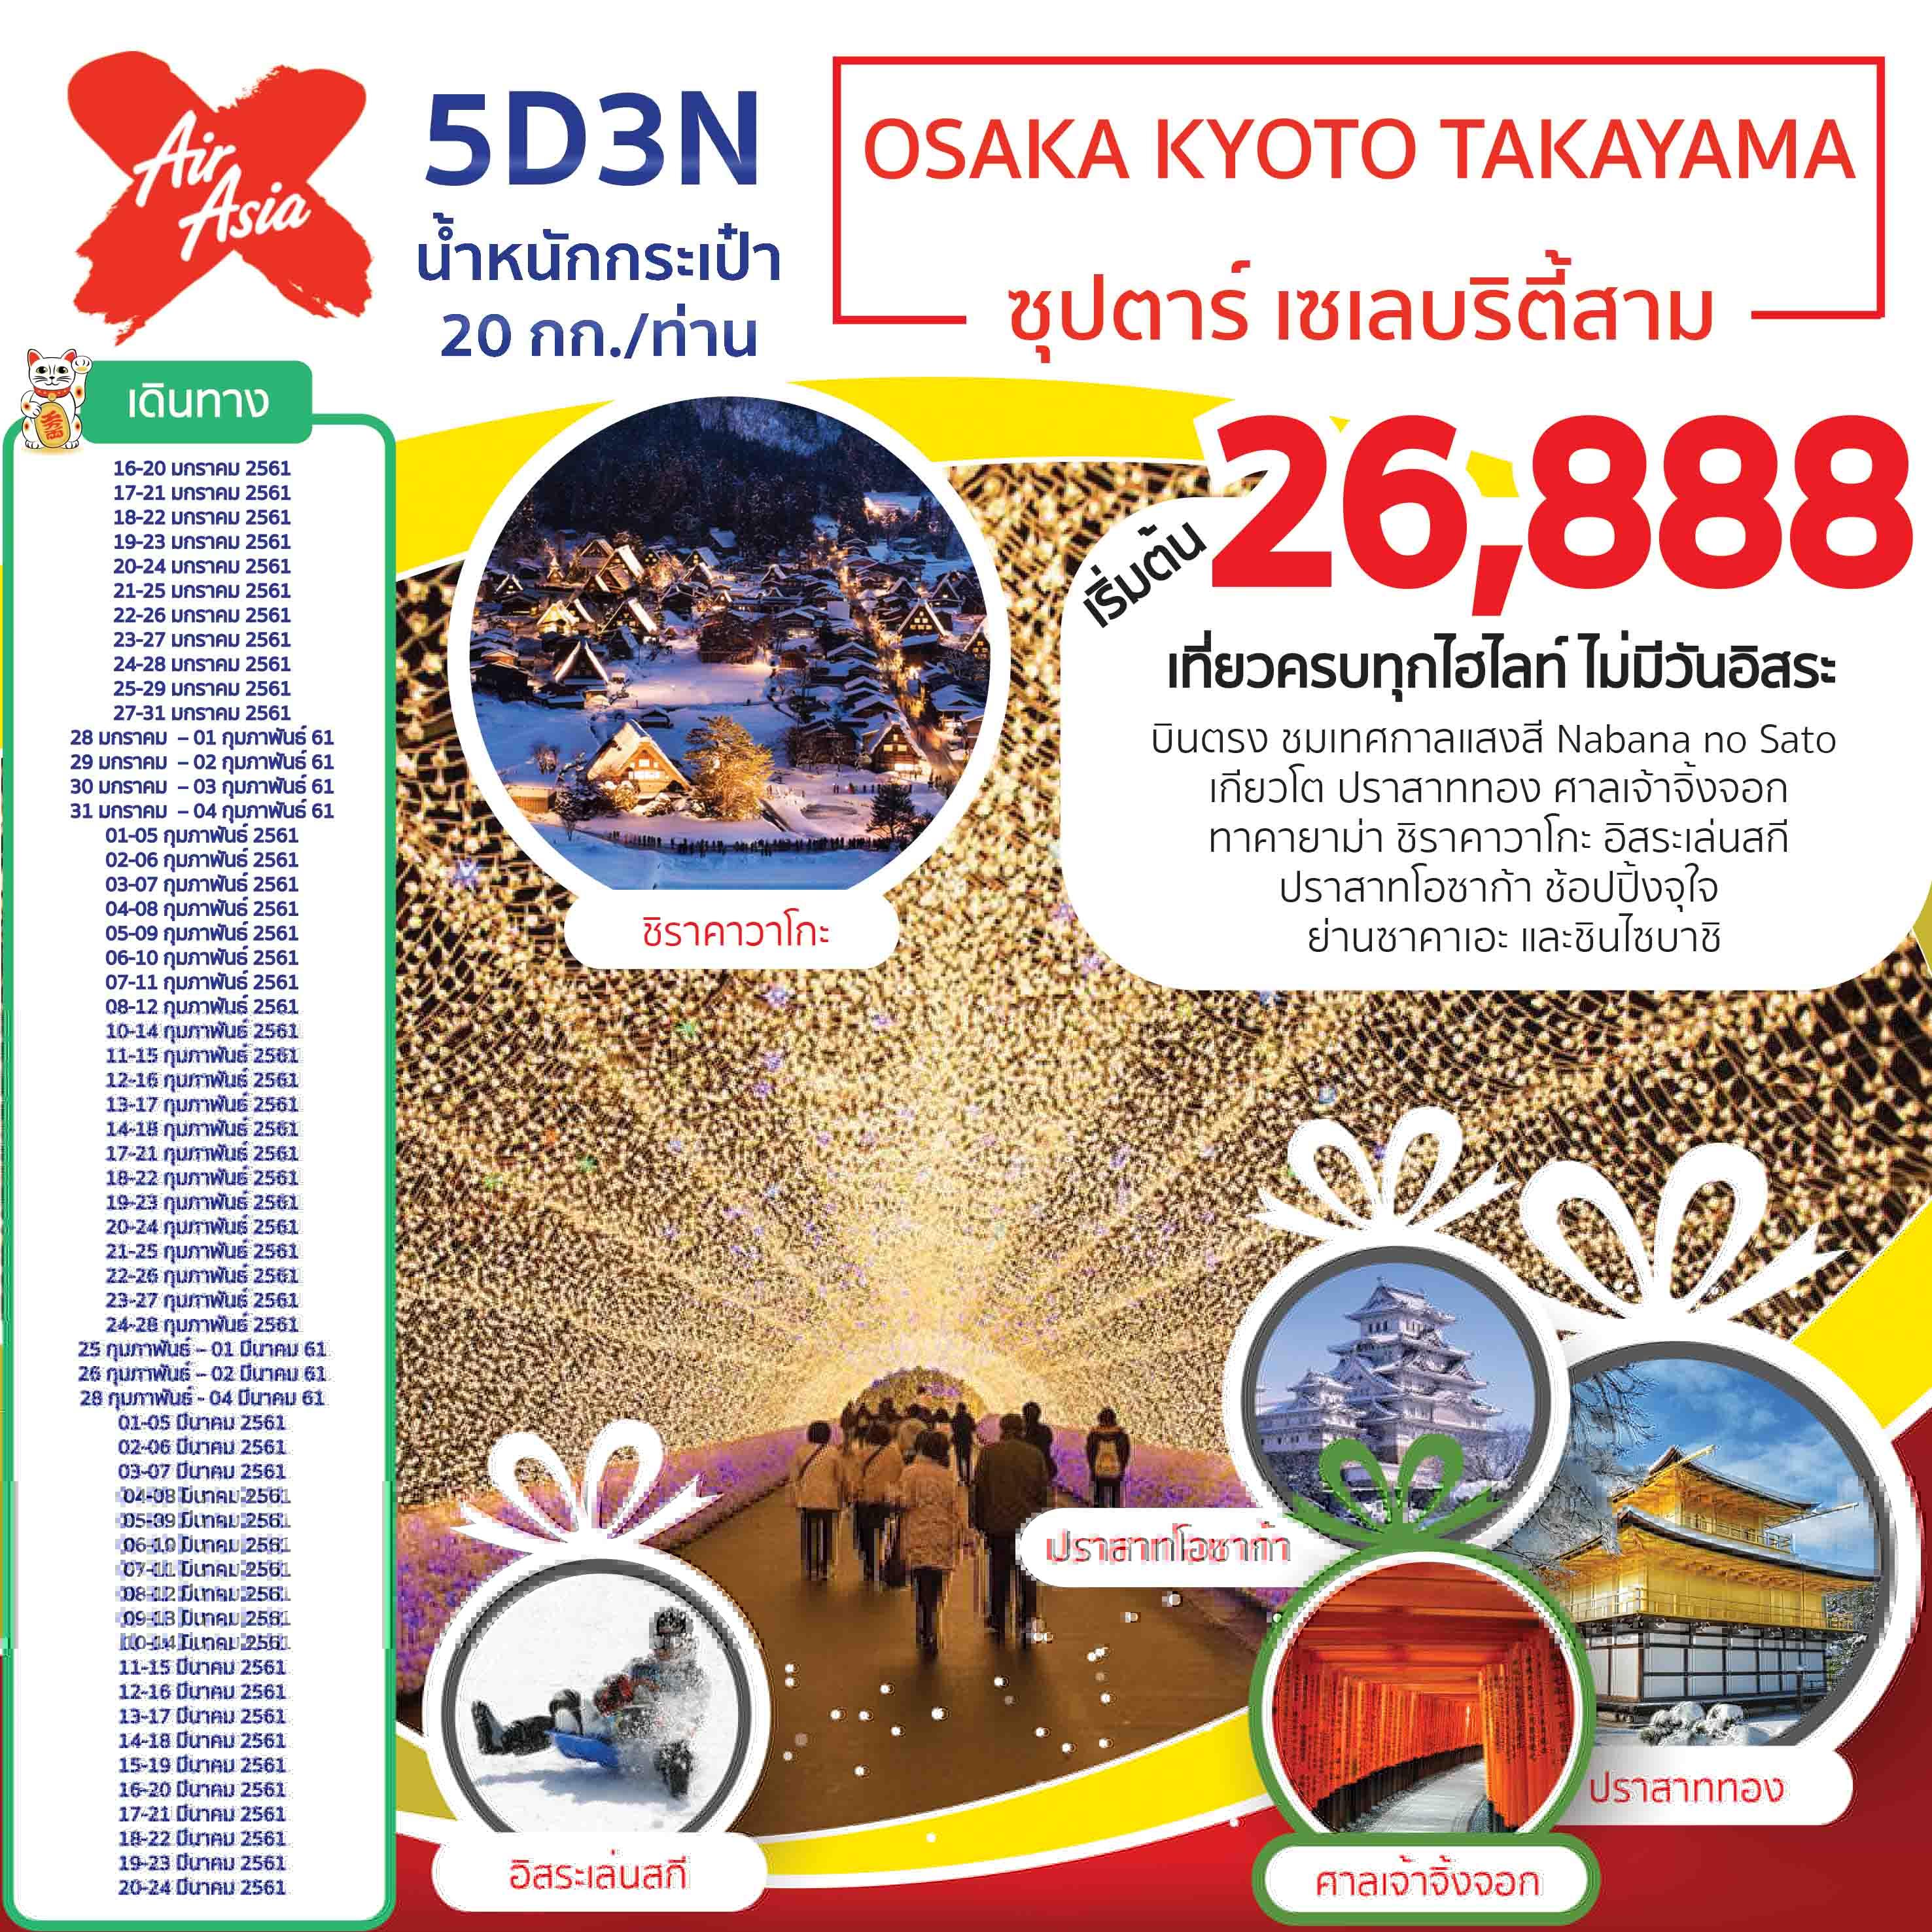 OSAKA KYOTO TAKAYAMA 5D3N (ซุปตาร์ เซเลบริตี้สาม)